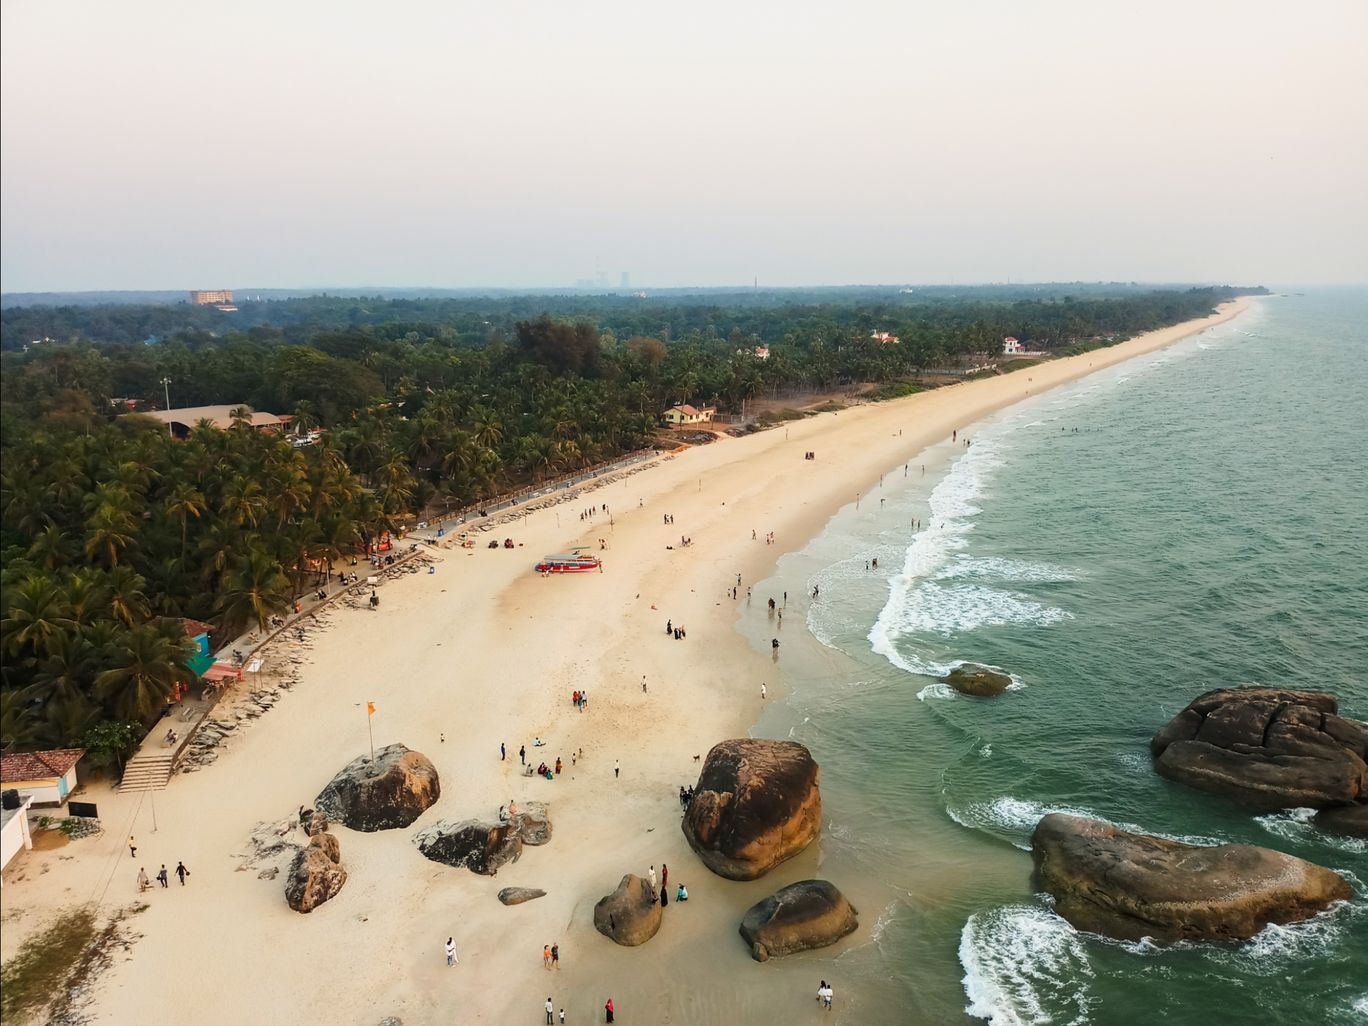 Photo of Kaup Beach By Praseeda Bhat